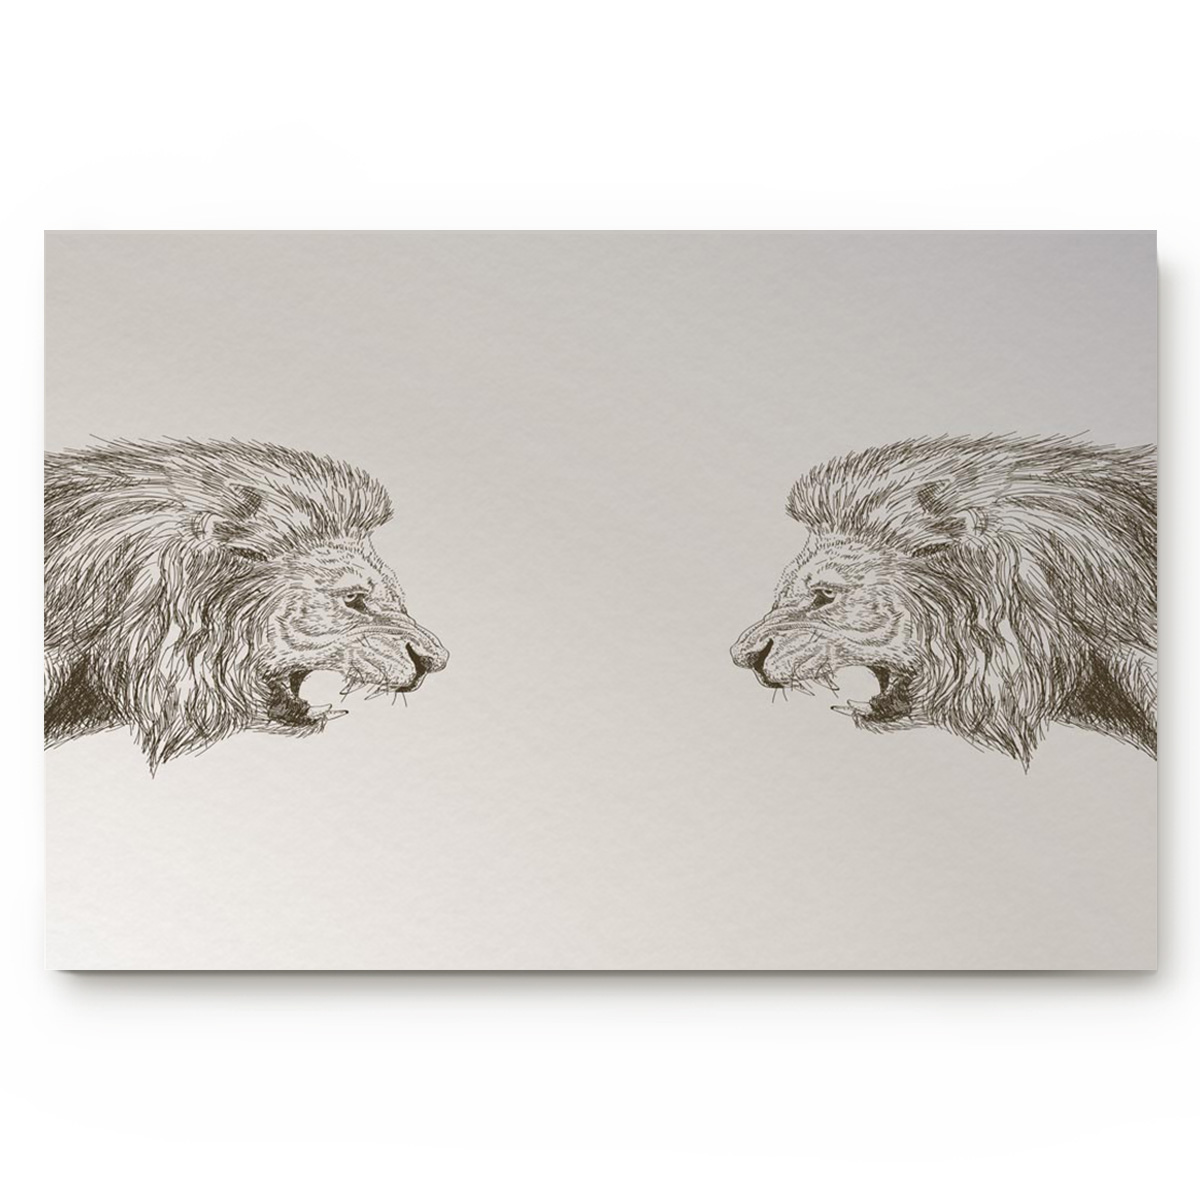 Simple Hand Drawn Lion Animal Modern Bathroom Accessories Non Slip Doormat Living Room Kitchen Doormat Matras Keset Aliexpress